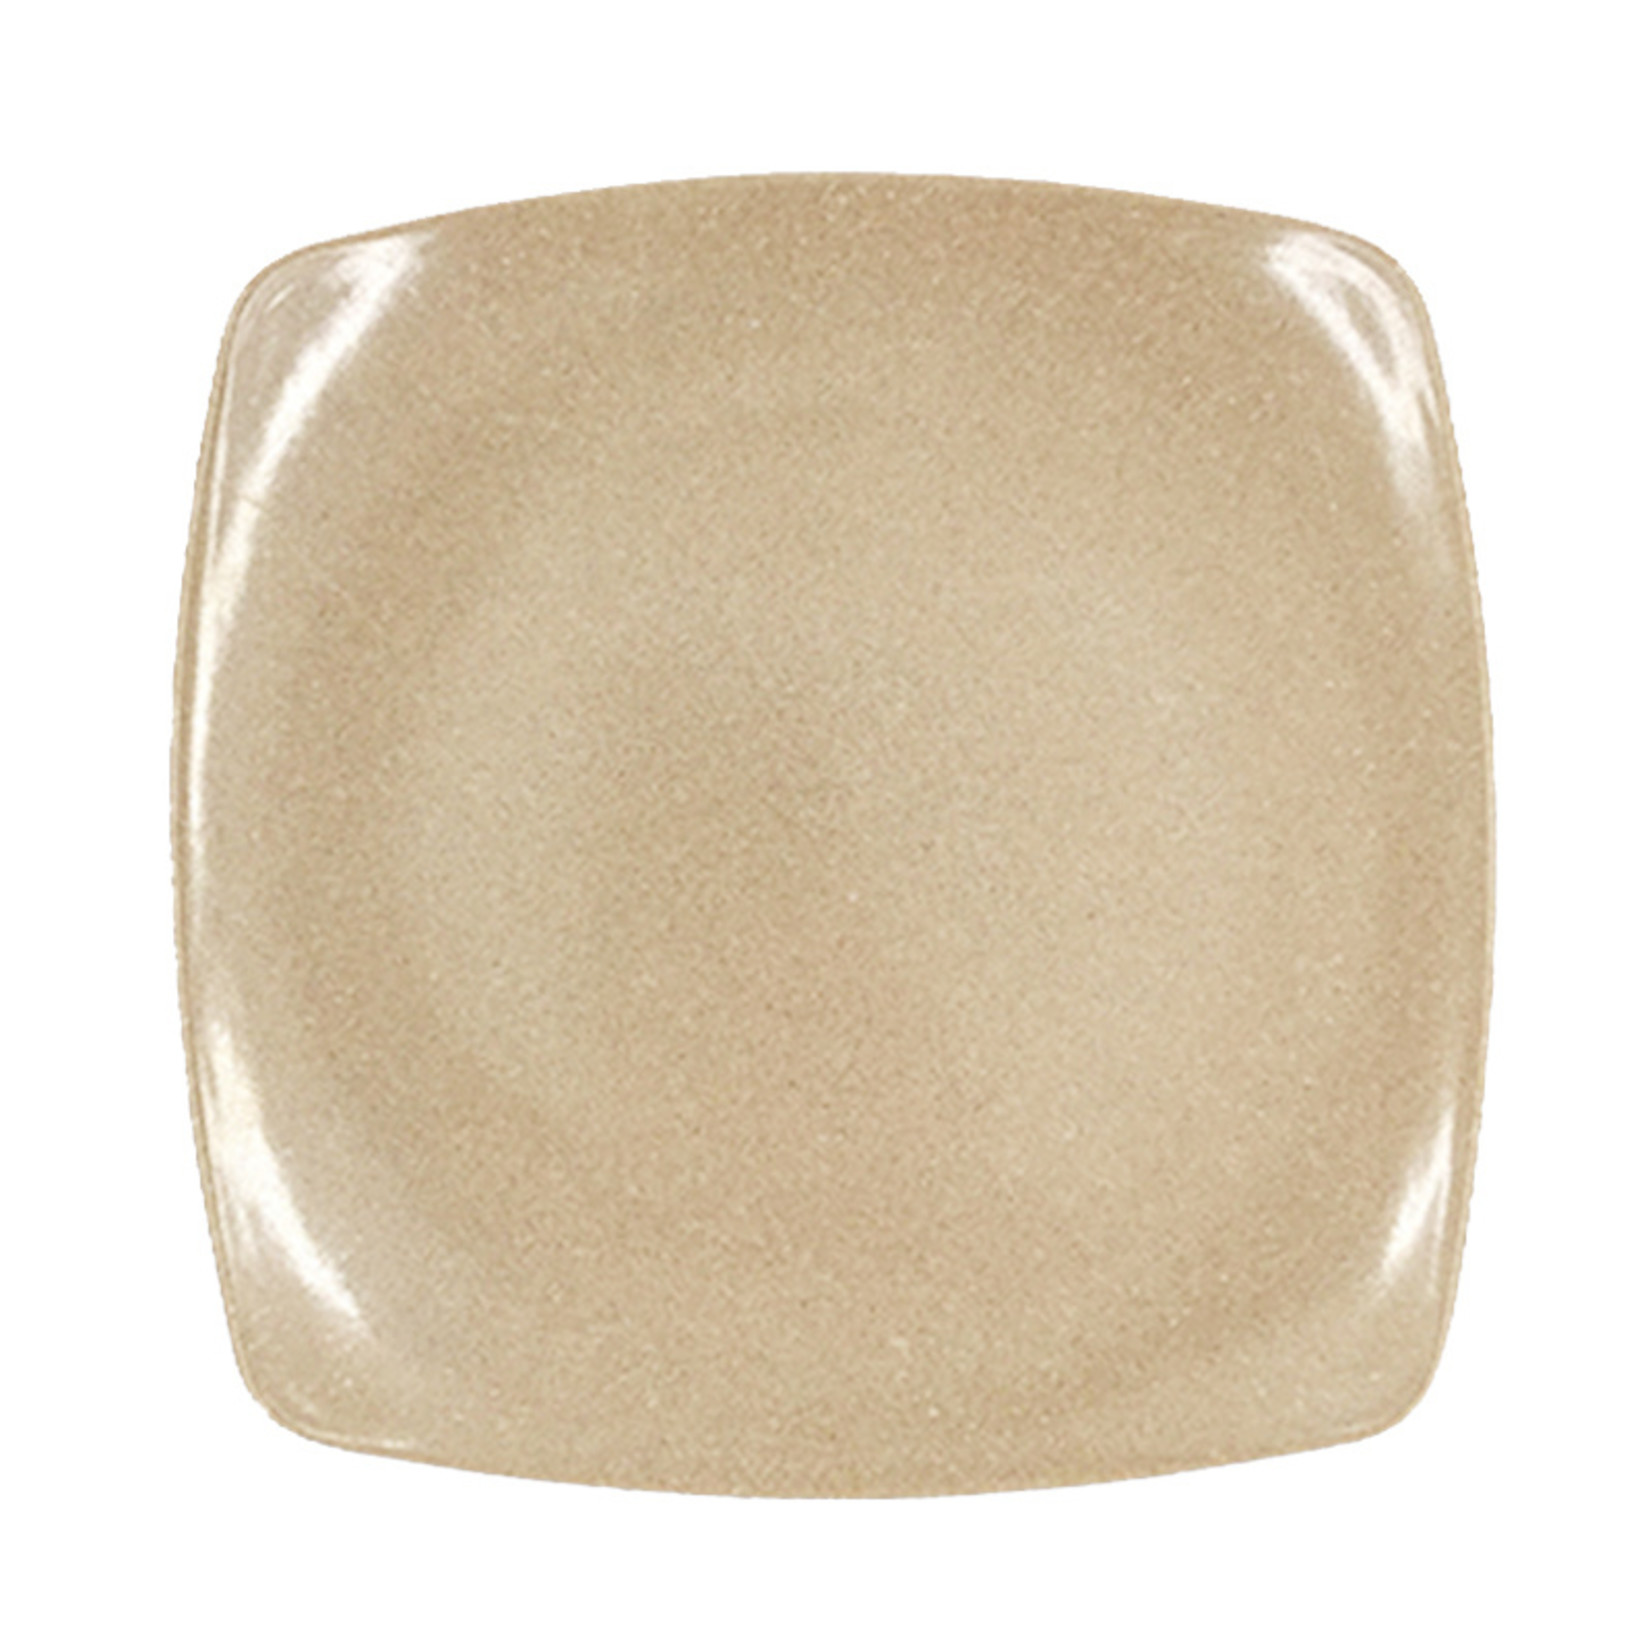 EcoSoulife EcoSoulife Husk Square Plate